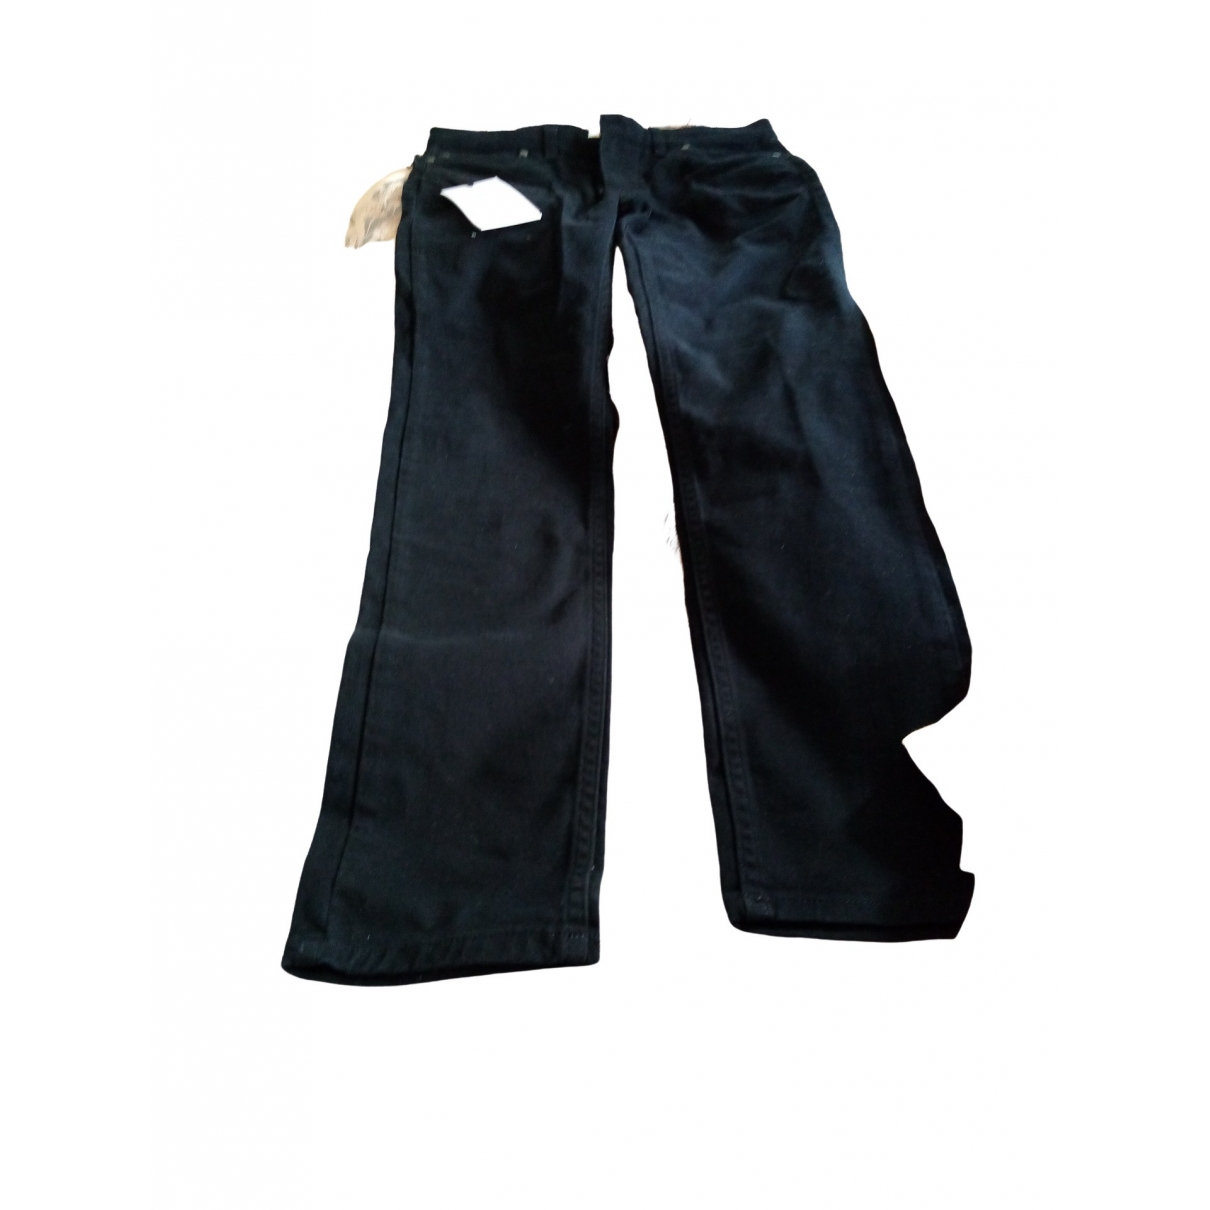 Farah \N Black Cotton Trousers for Men 32 UK - US